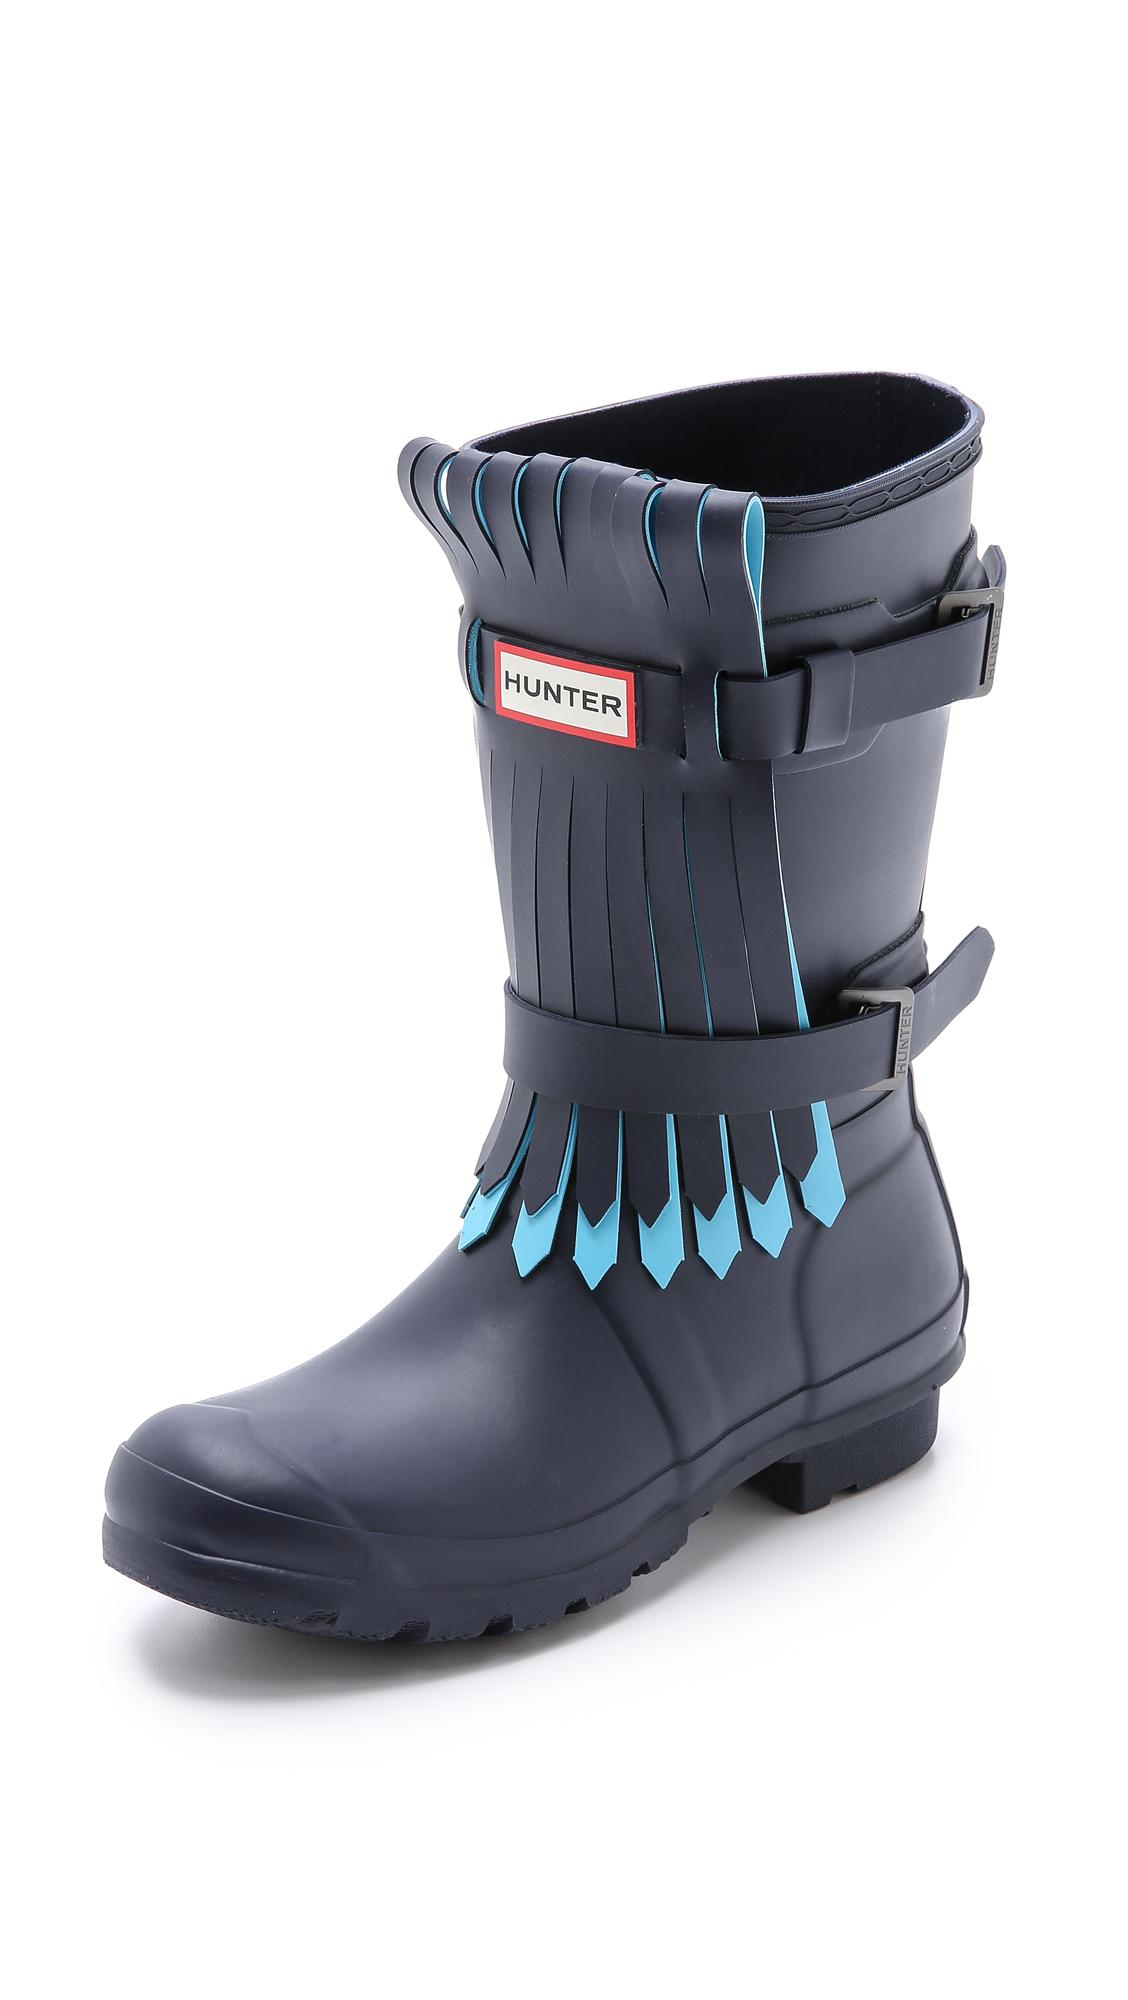 Lyst Hunter Original Fringe Short Boots Black Dark